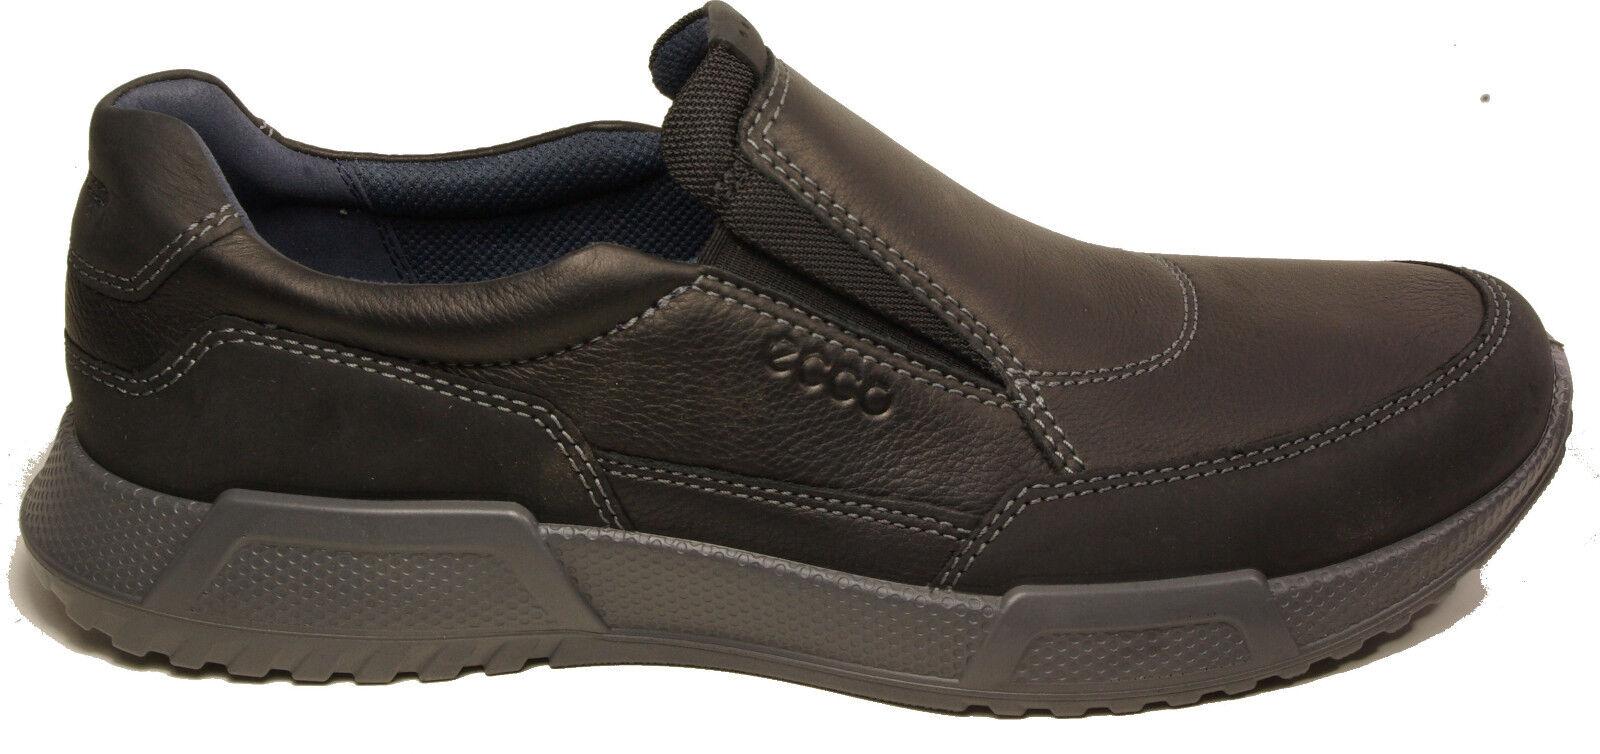 ECCO Schuhe Modell LUCA Slipper Halbschuhe schwarz Leder NEU